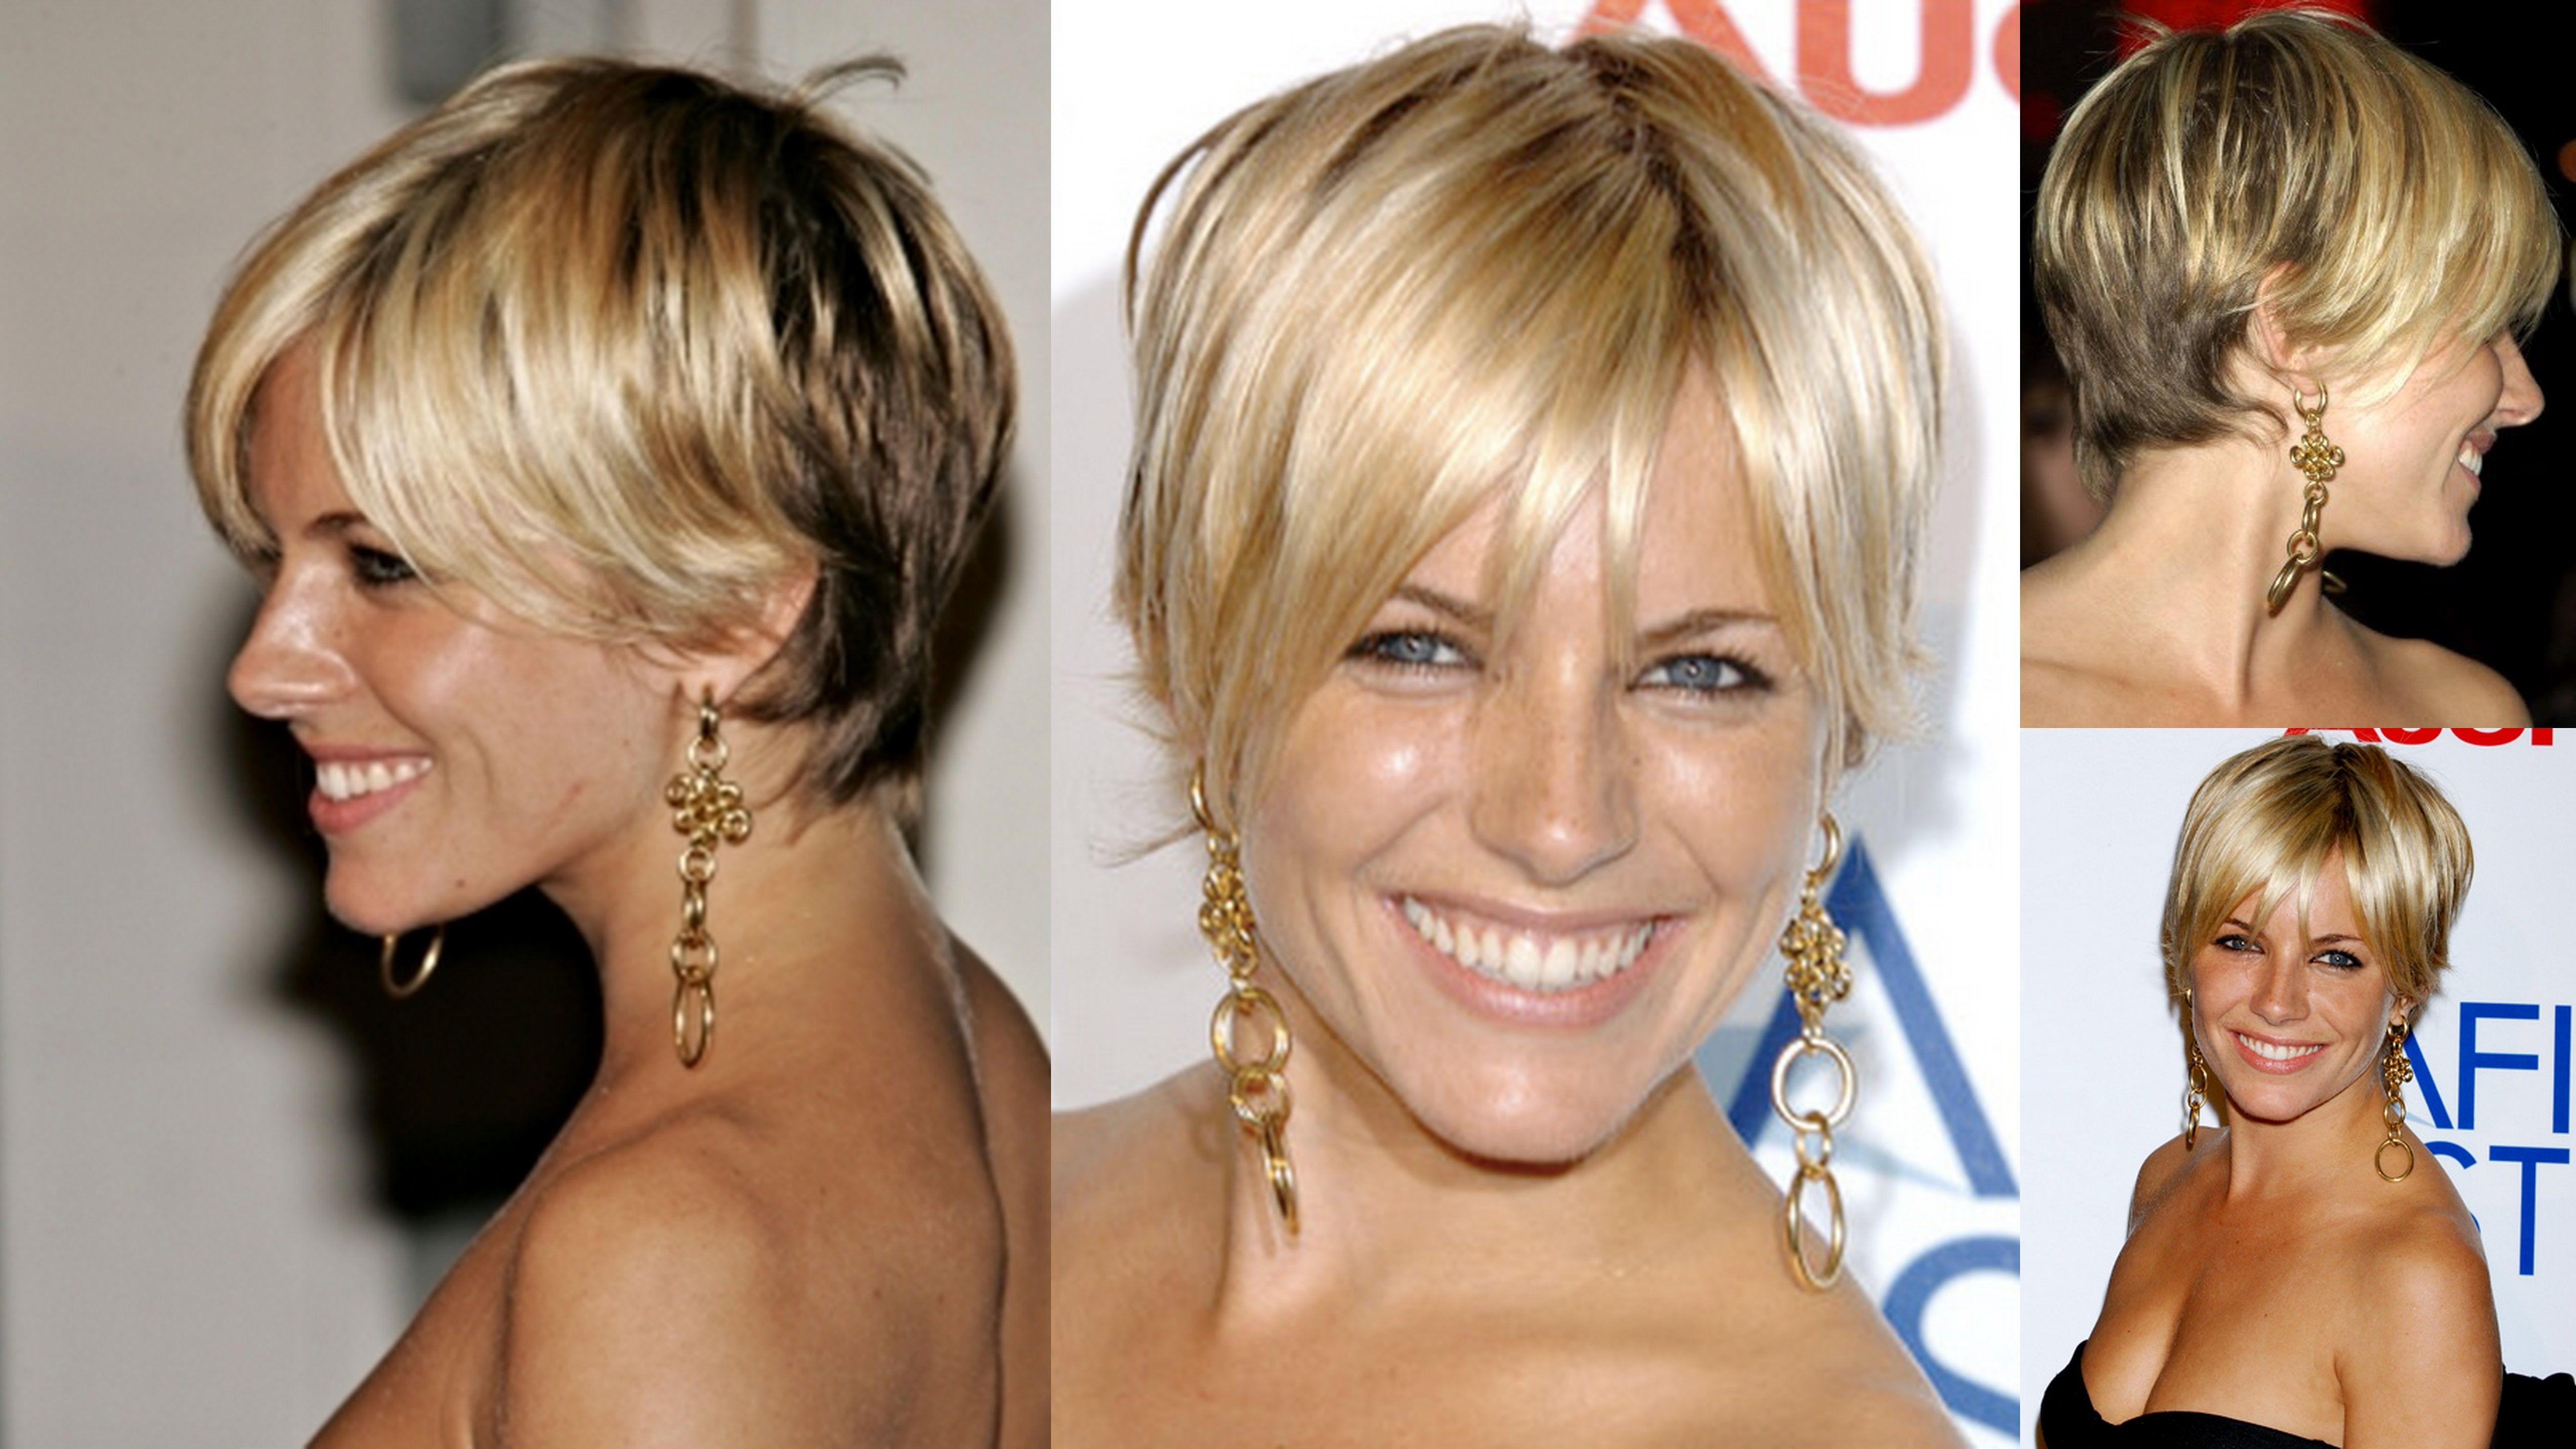 sienna miller short hair | LAME} Hair today, gone tomorrow - Crash ...